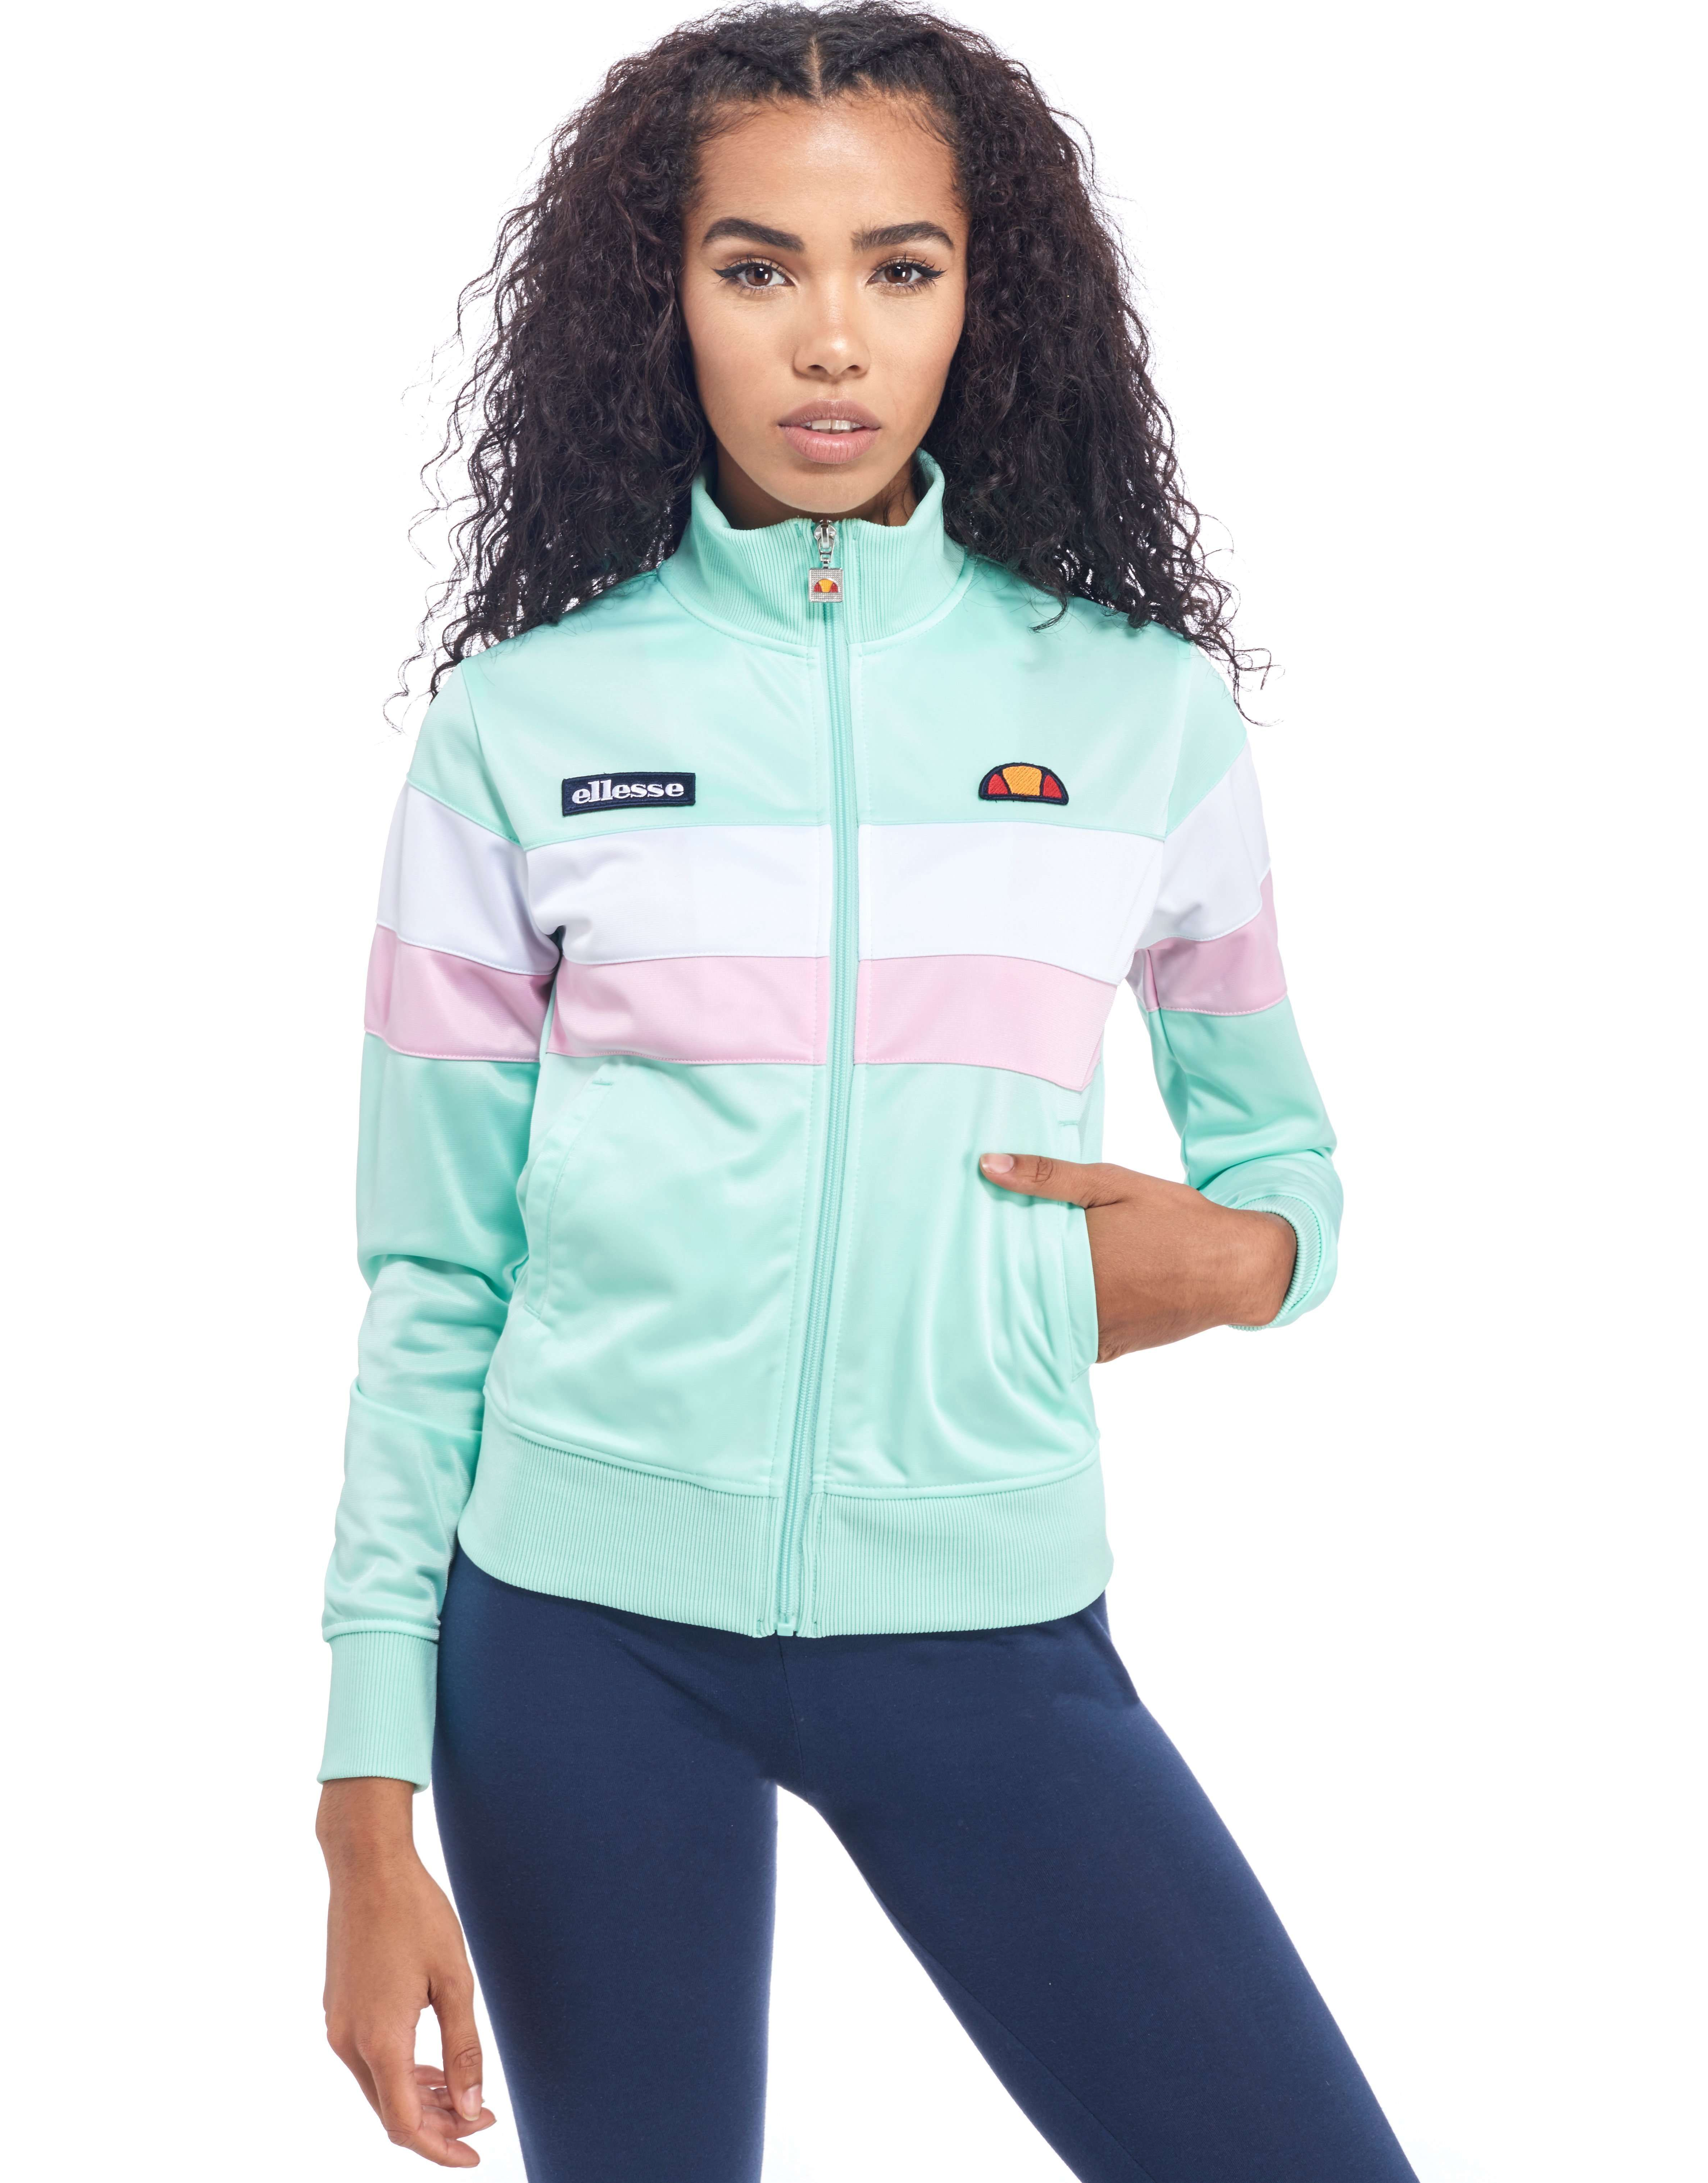 6b5237f0e92 Ellesse Piemonte Track Top - Shop online for Ellesse Piemonte Track Top  with JD Sports, the UK's leading sports fashion retailer.